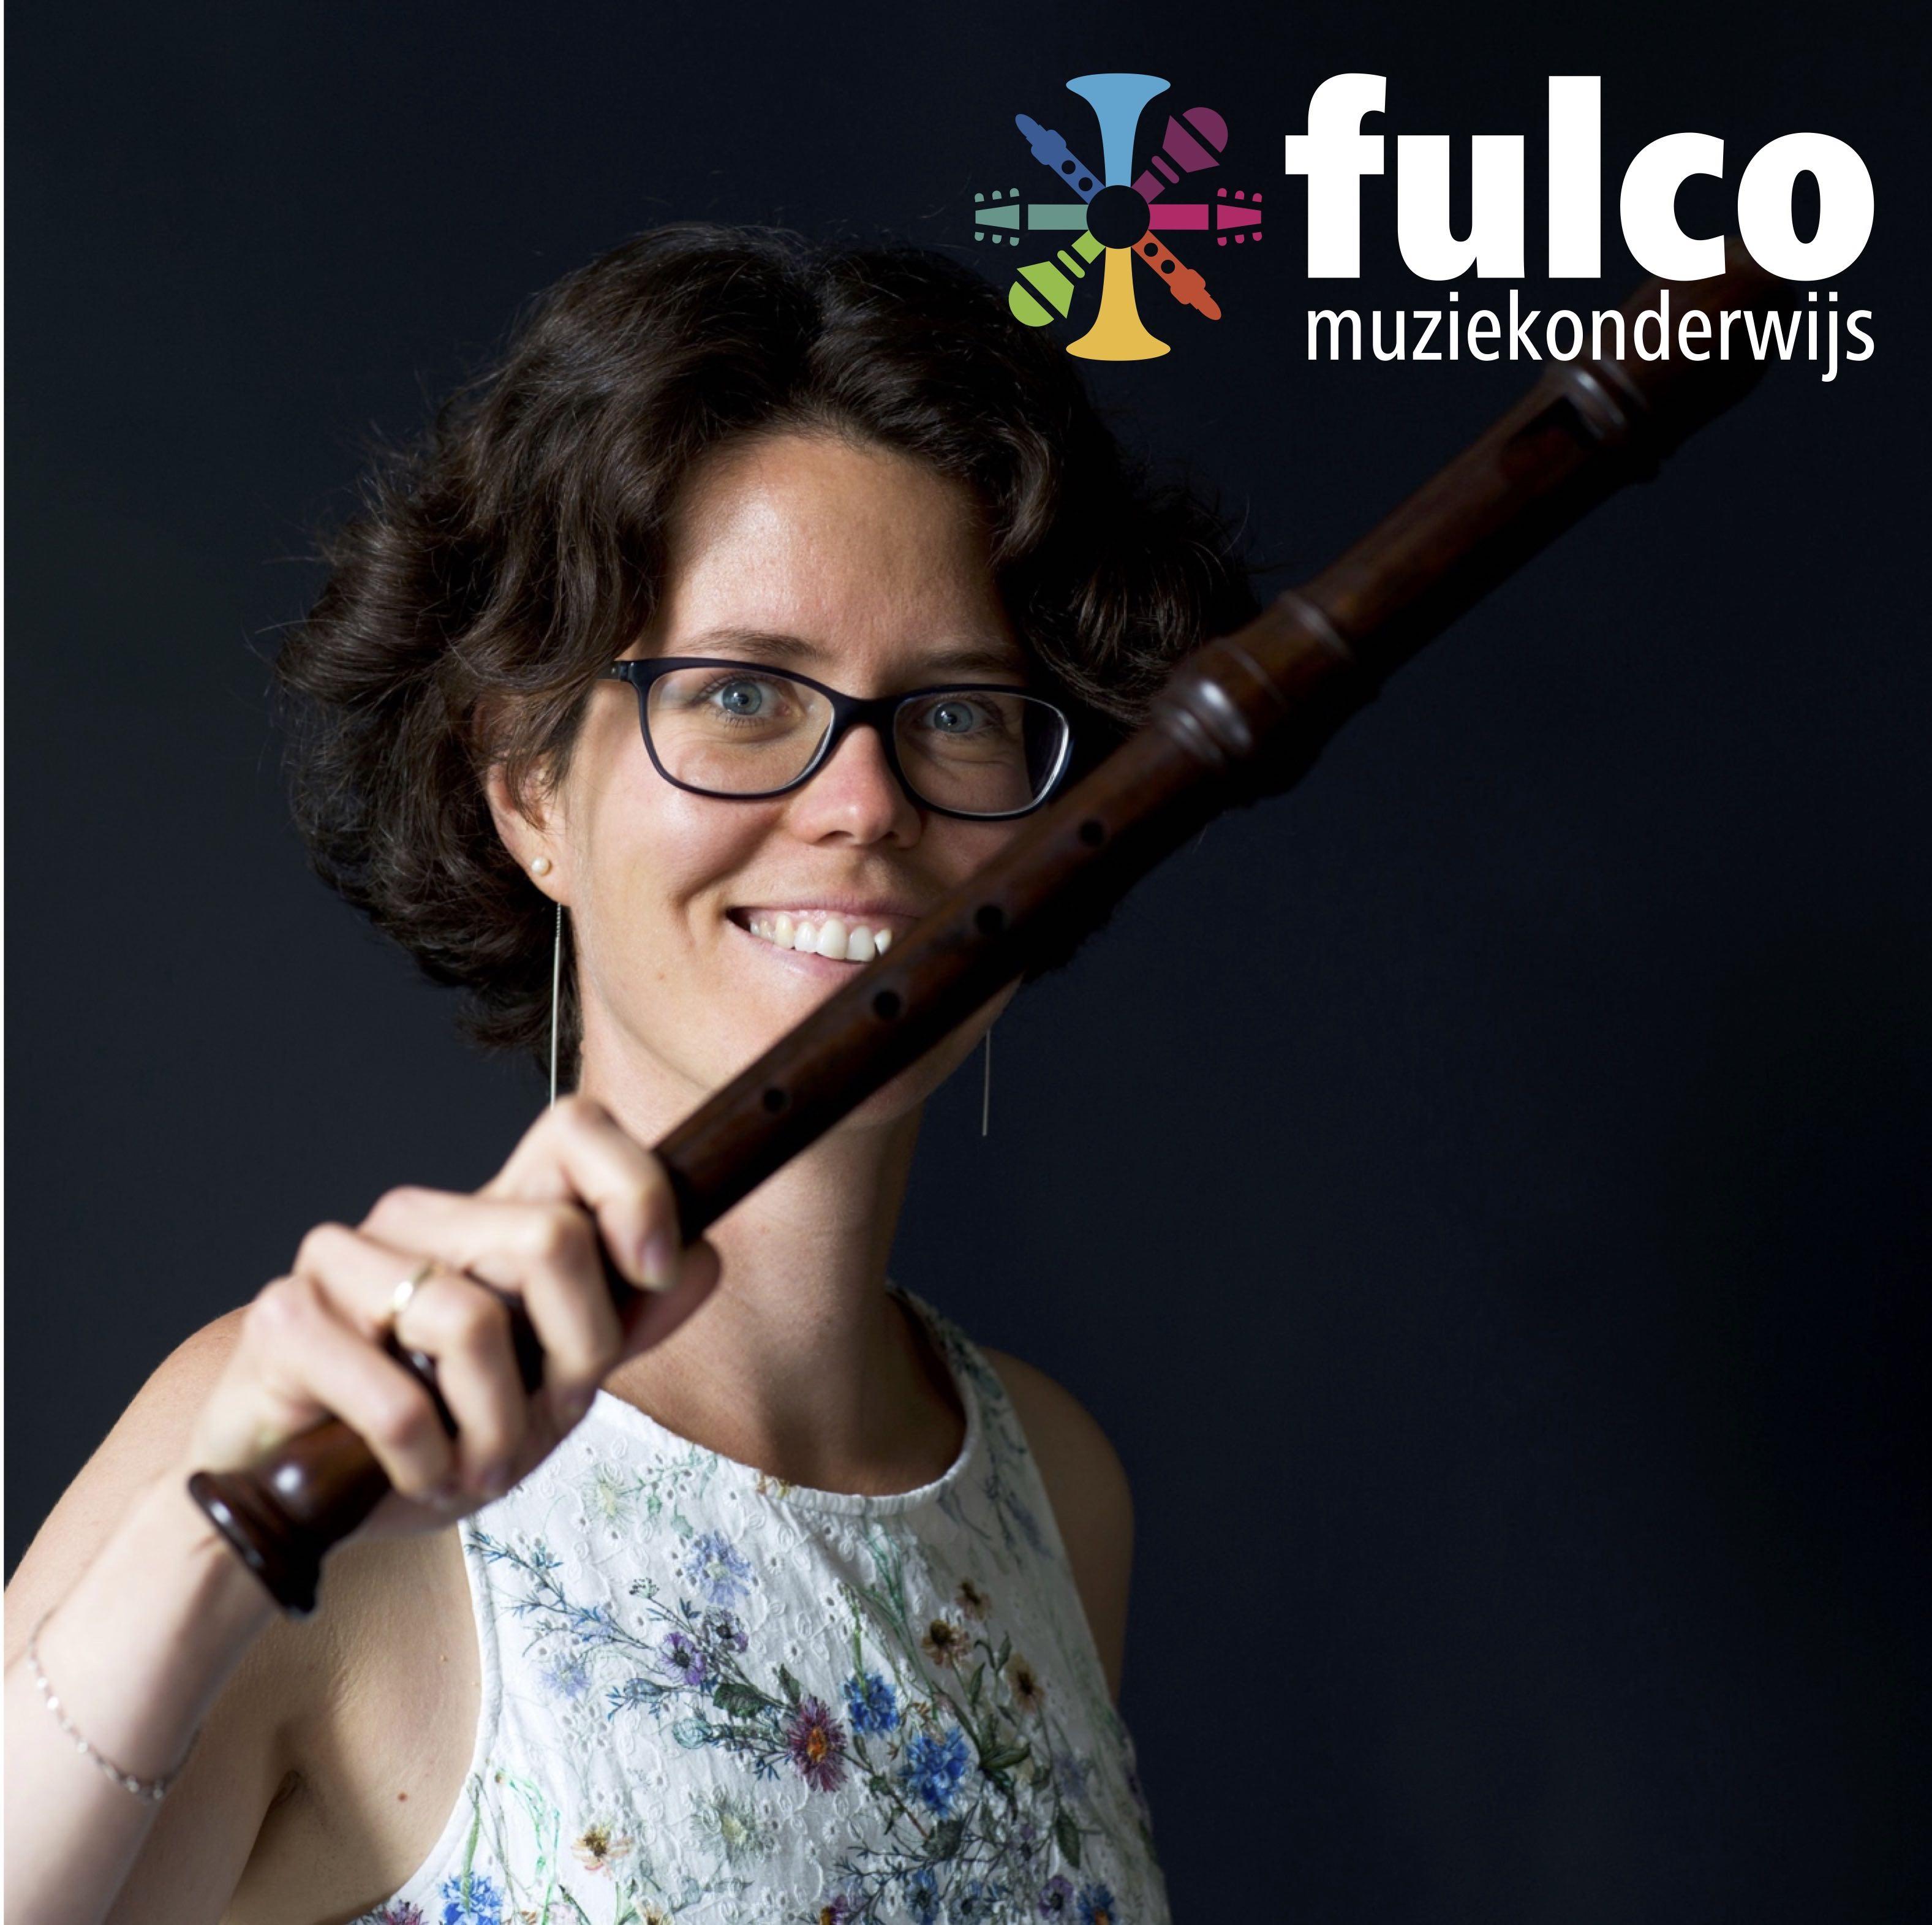 thumbnail foto-Szofia Pasztoi-docent-blokfluit-Fulco muziekonderwijs-IJsselstein